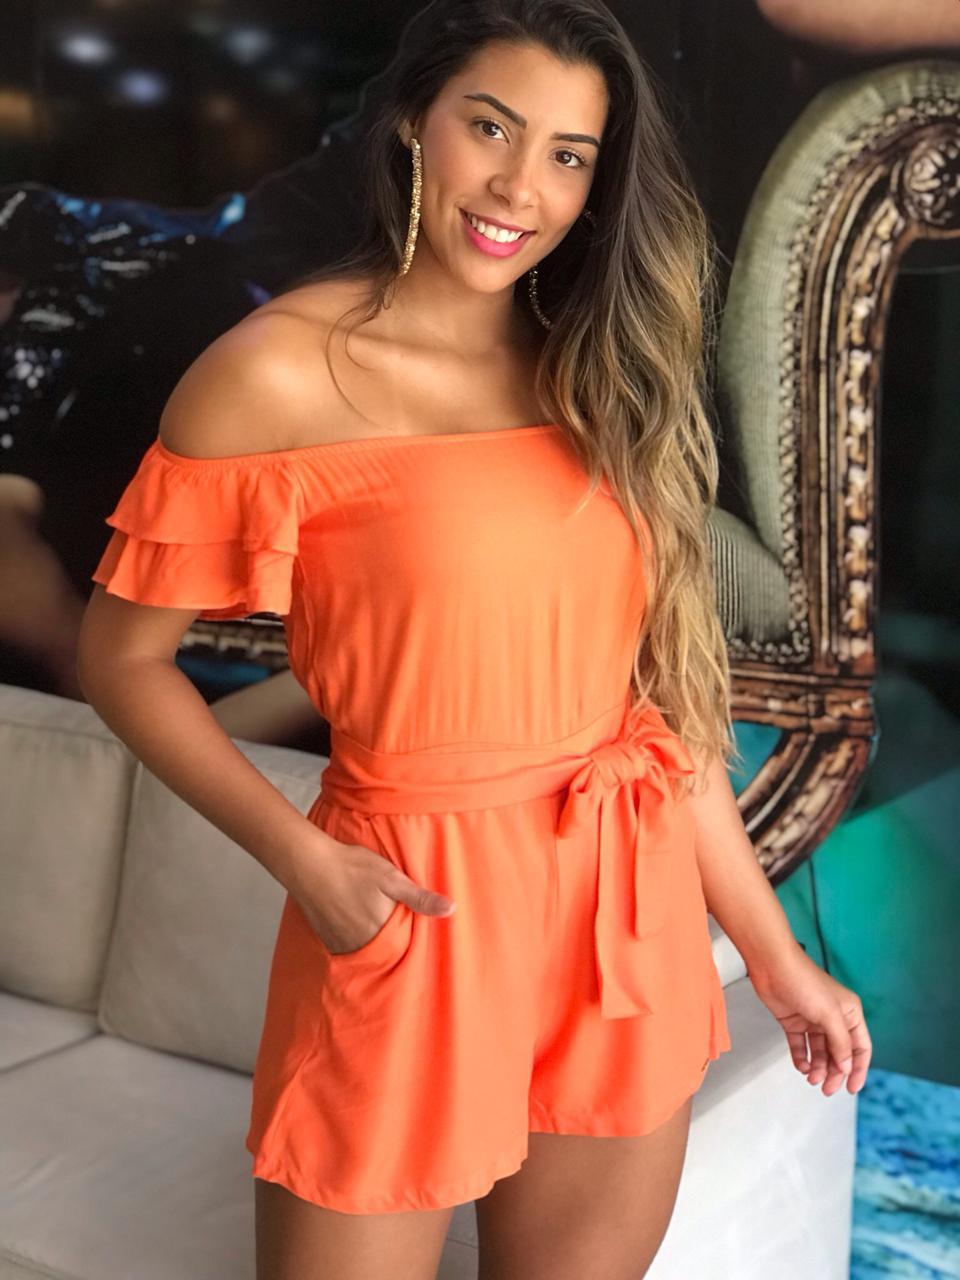 d8bccfdb0 Macacão Curto - VANKOKE - Moda Feminina - Vestidos